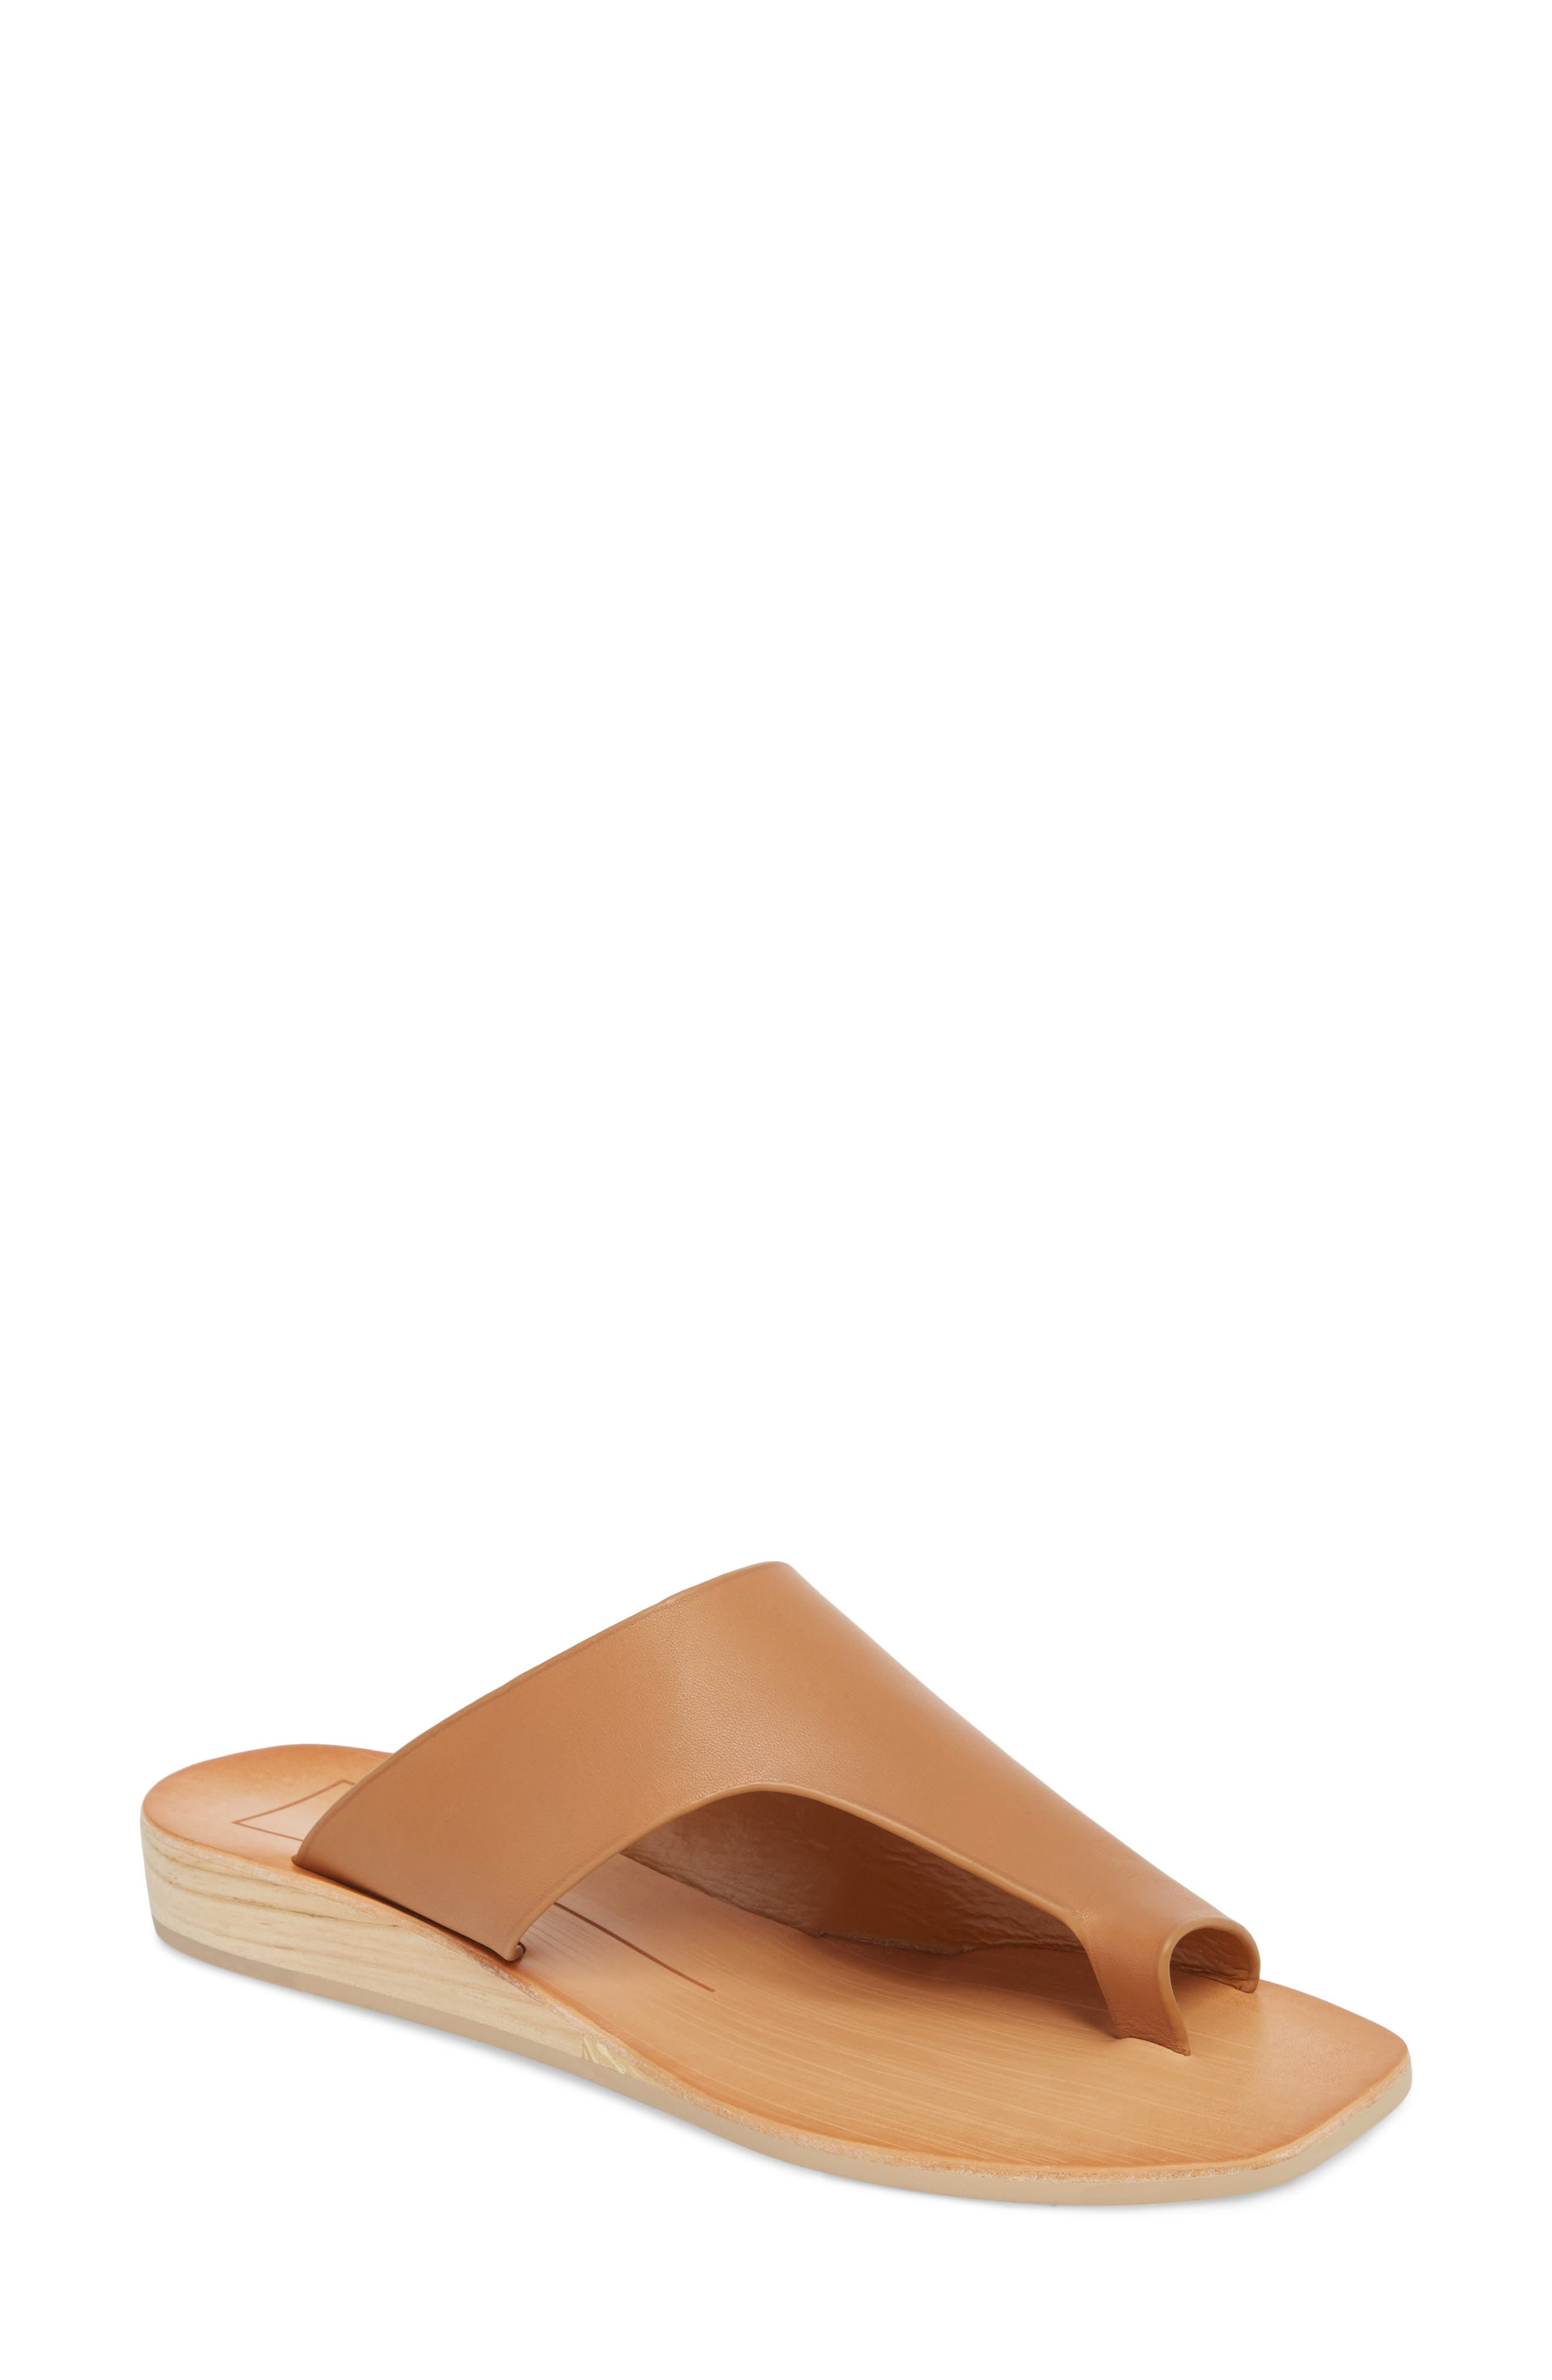 Dolce Vita Women's Hazle Asymmetrical Toe Loop Sandal